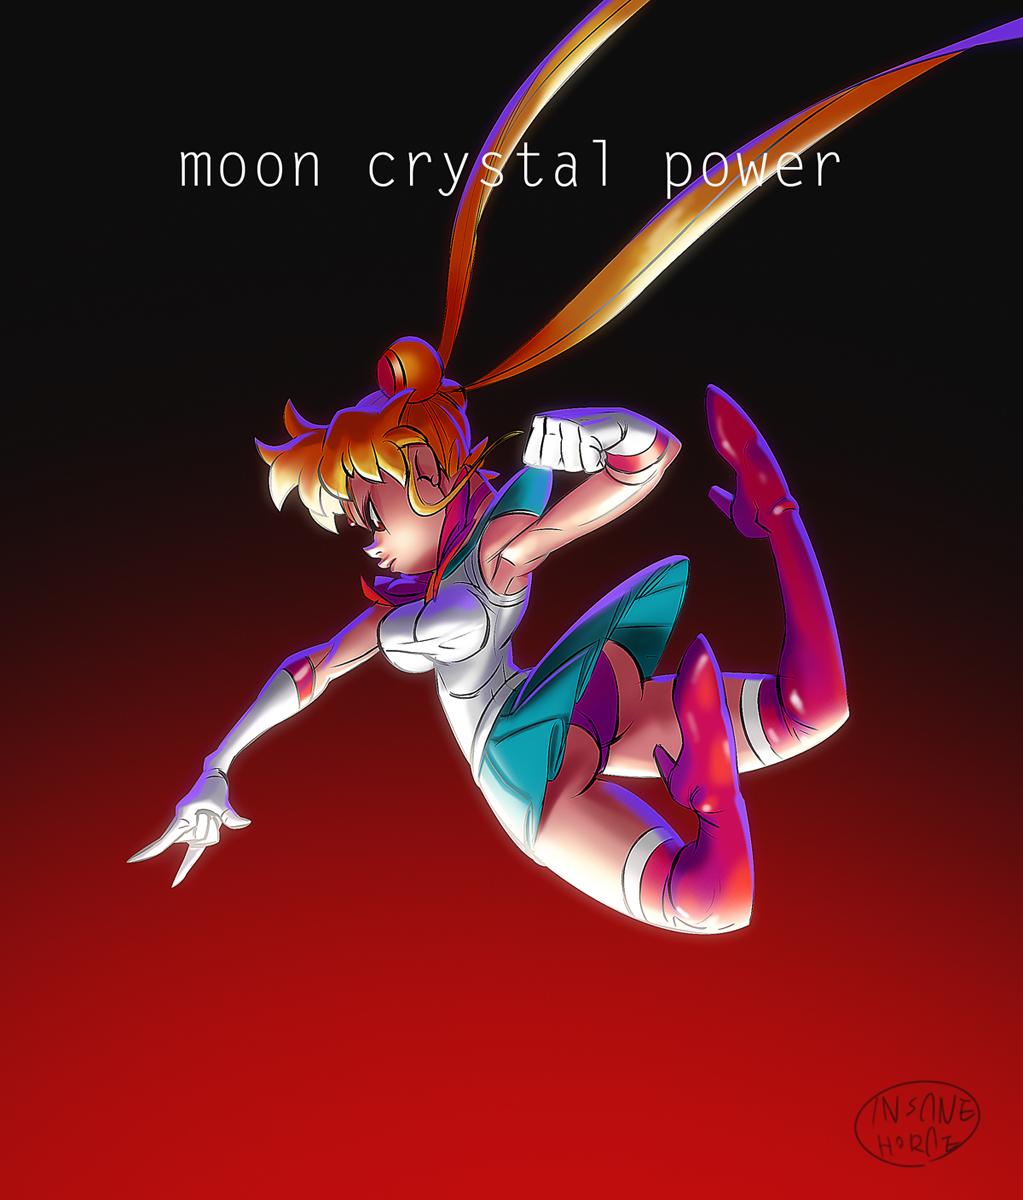 Character Design Challenge Sailor Moon : Doodles on behance